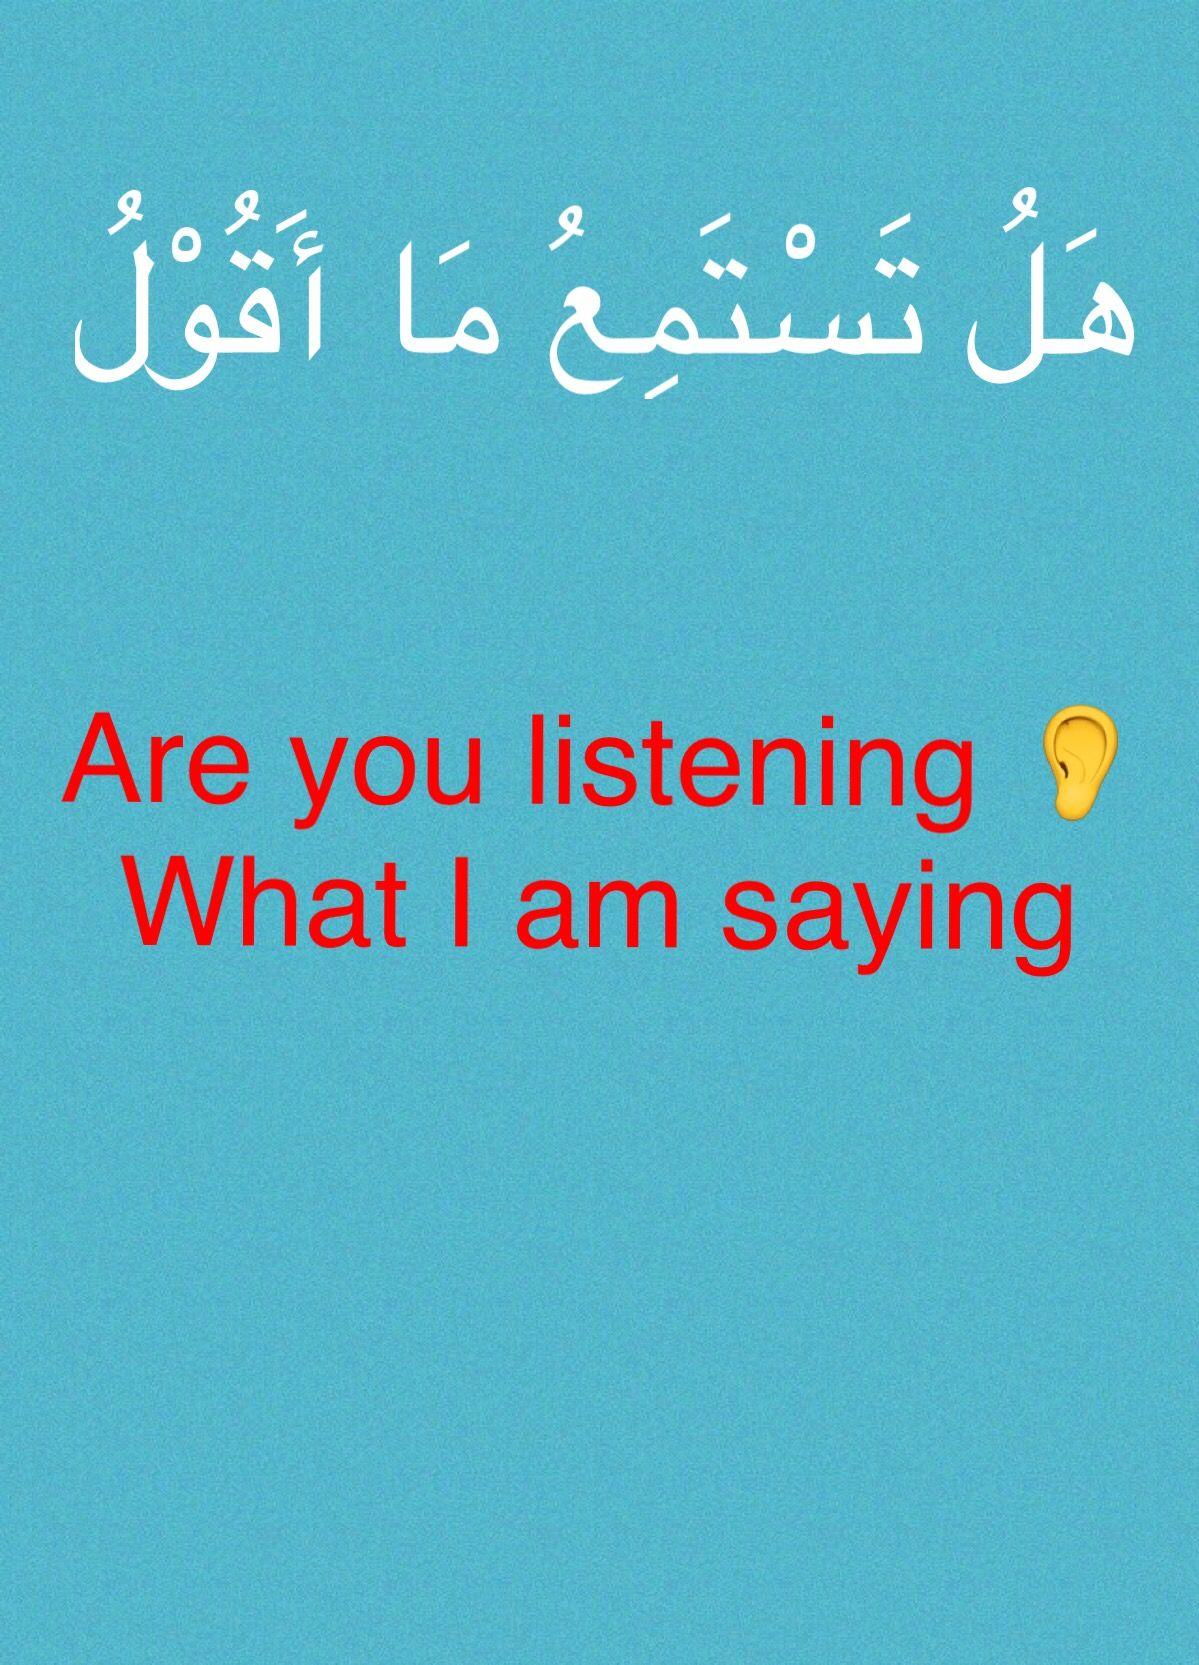 Learning Arabic Msa Fabiennem English Phonics Learn English Words English Language Learning Grammar